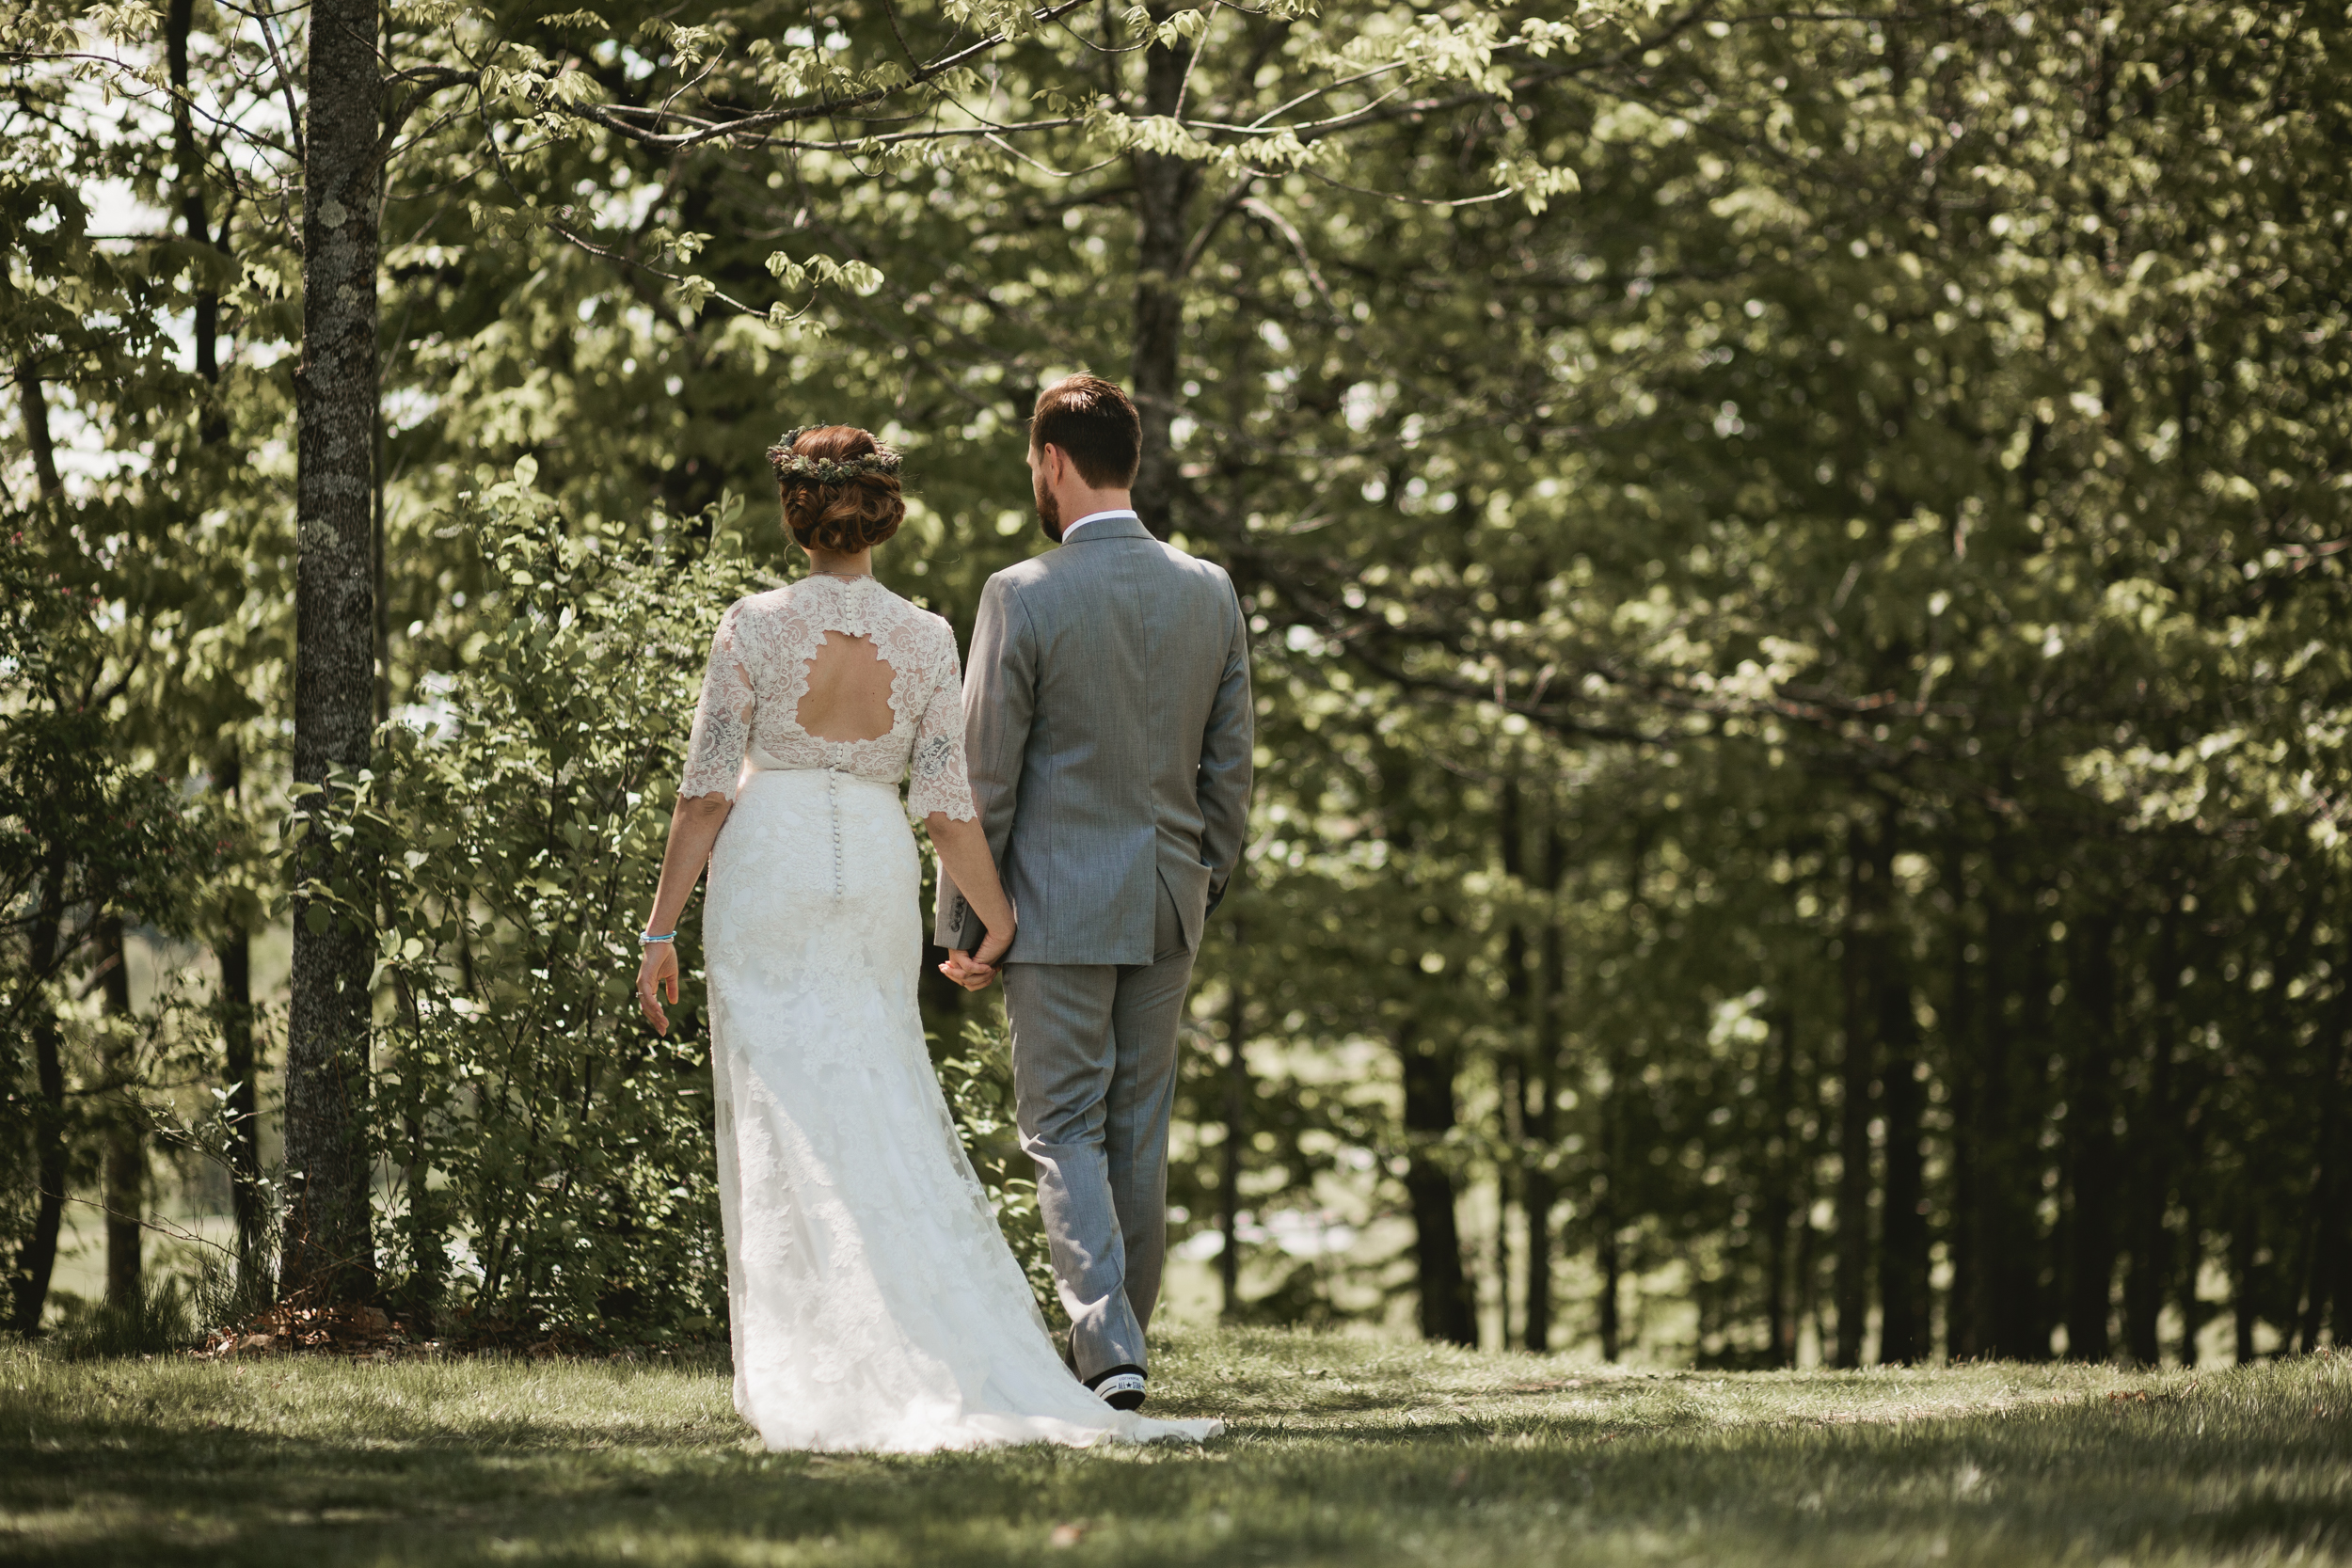 Spring-Meadows-Maine-Wedding-101.jpg